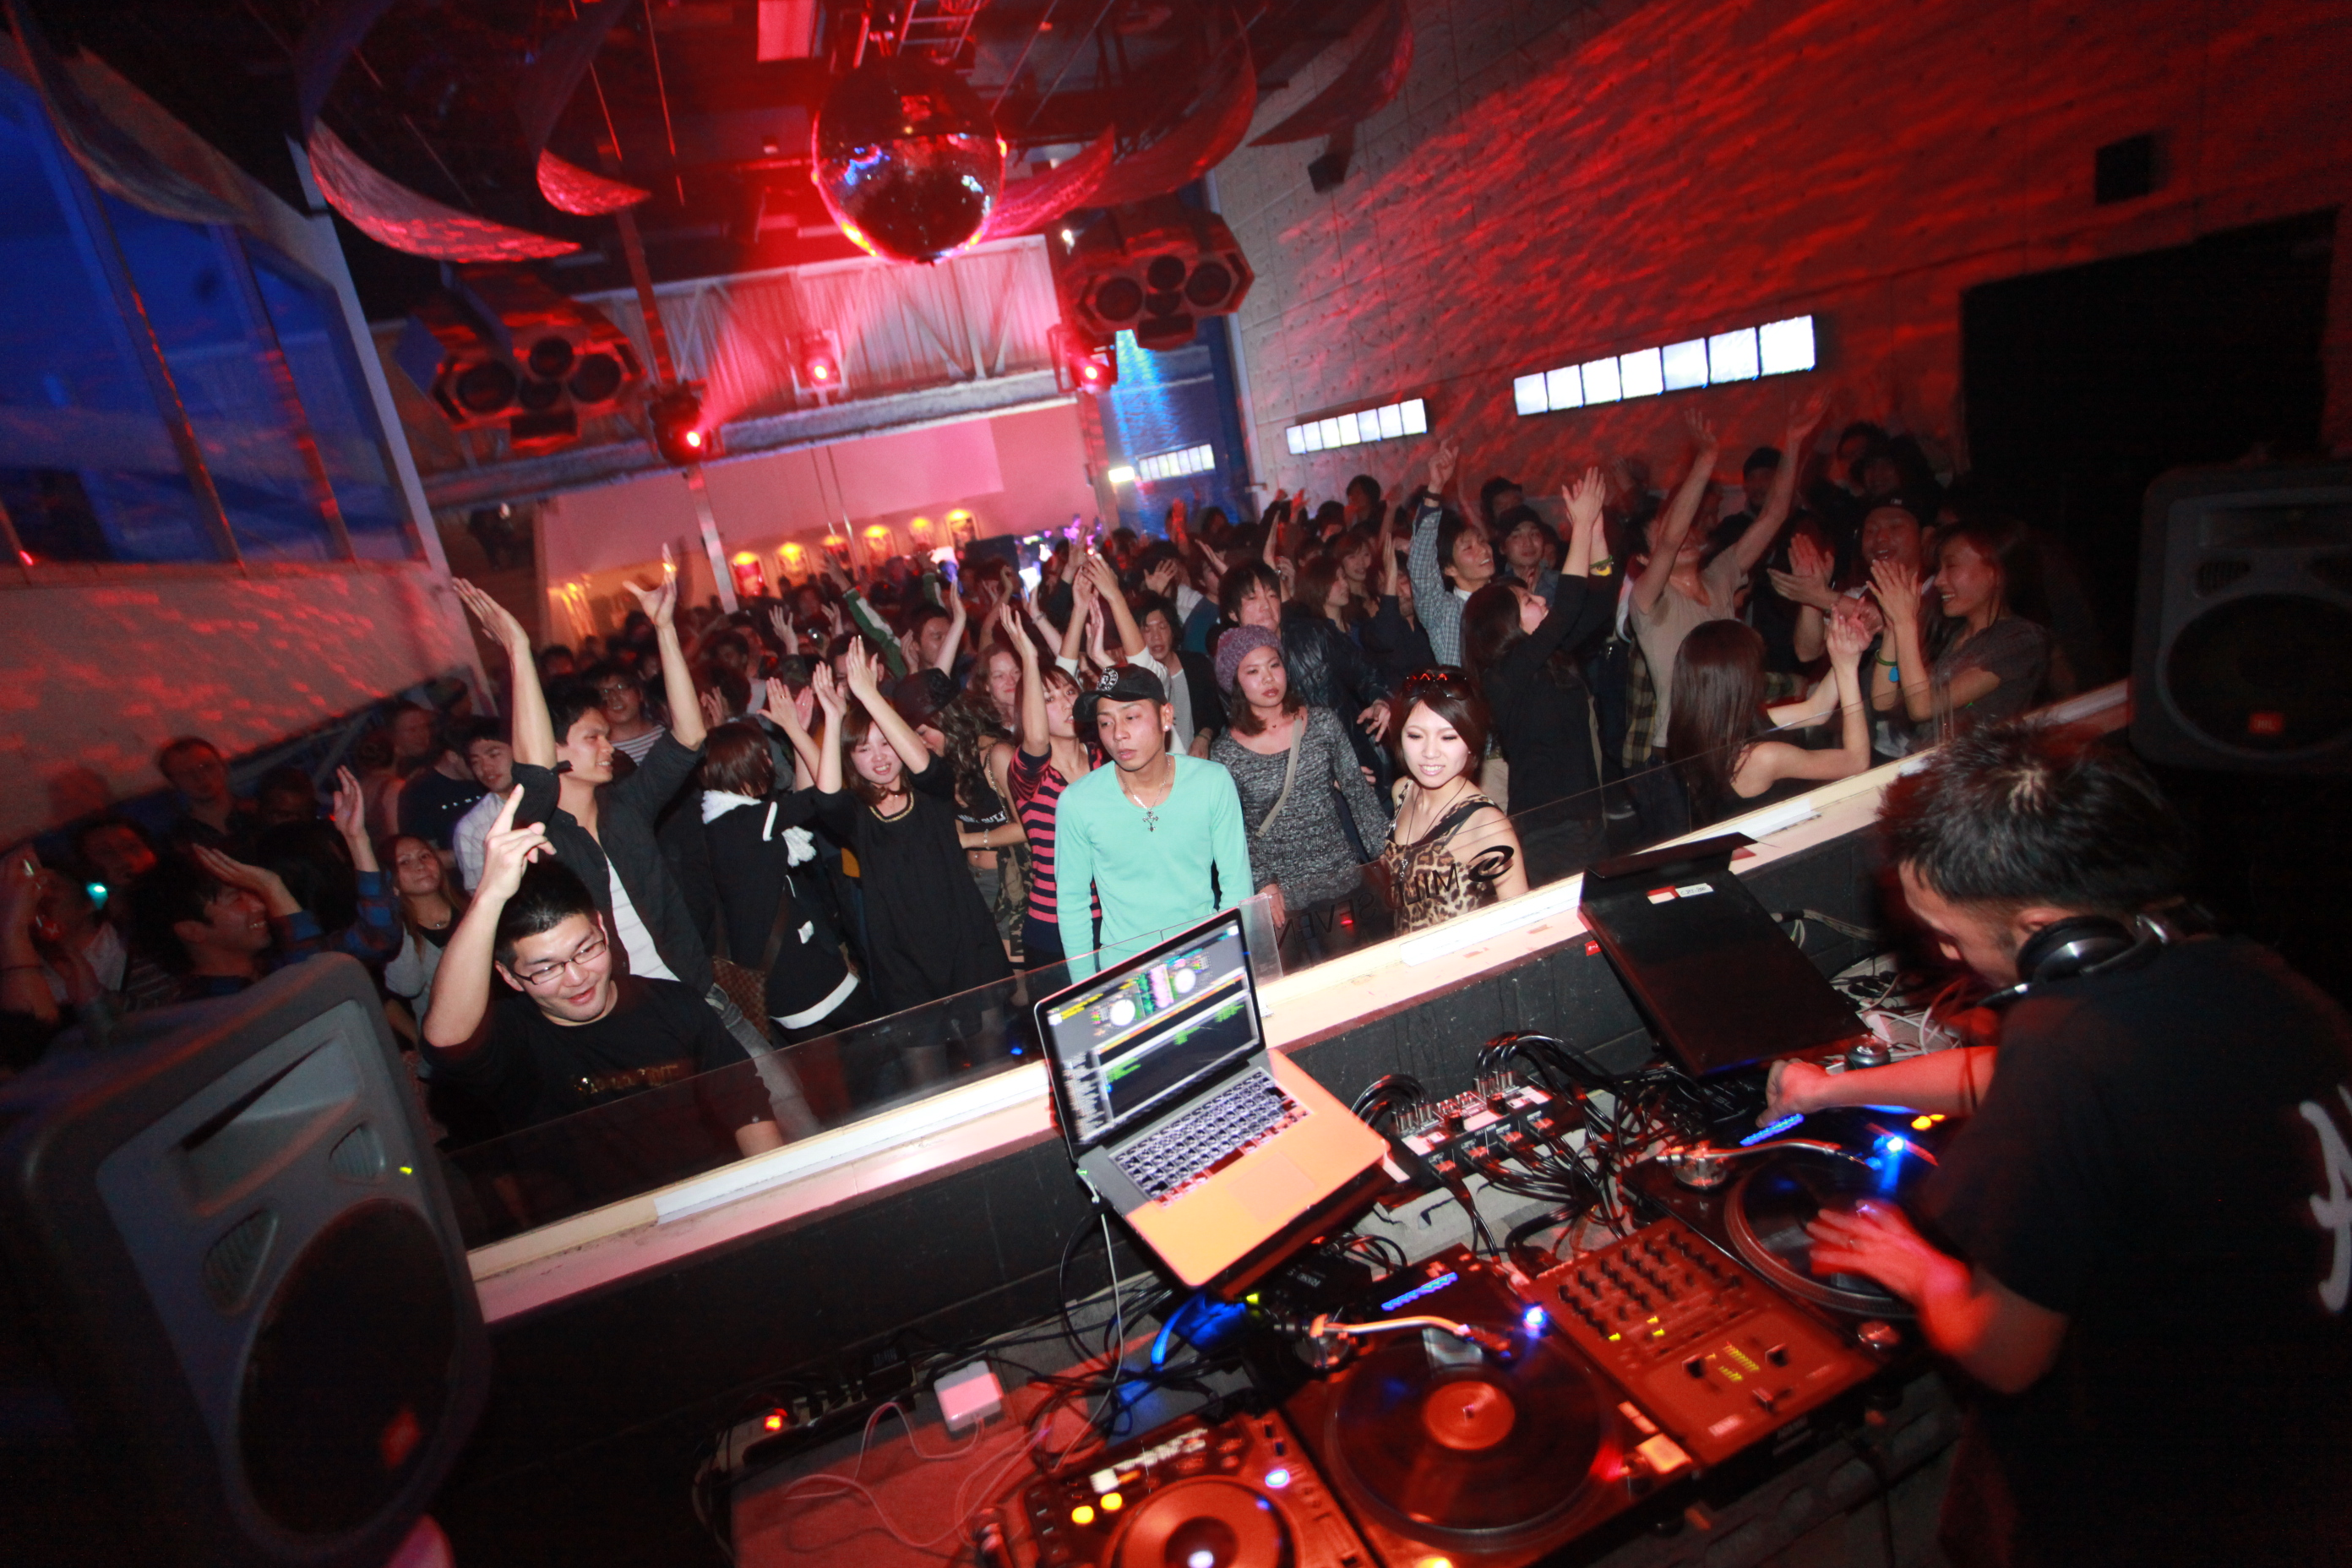 Ageha Tokyo | Colossal nightclub in Koto | Biggest club of ...